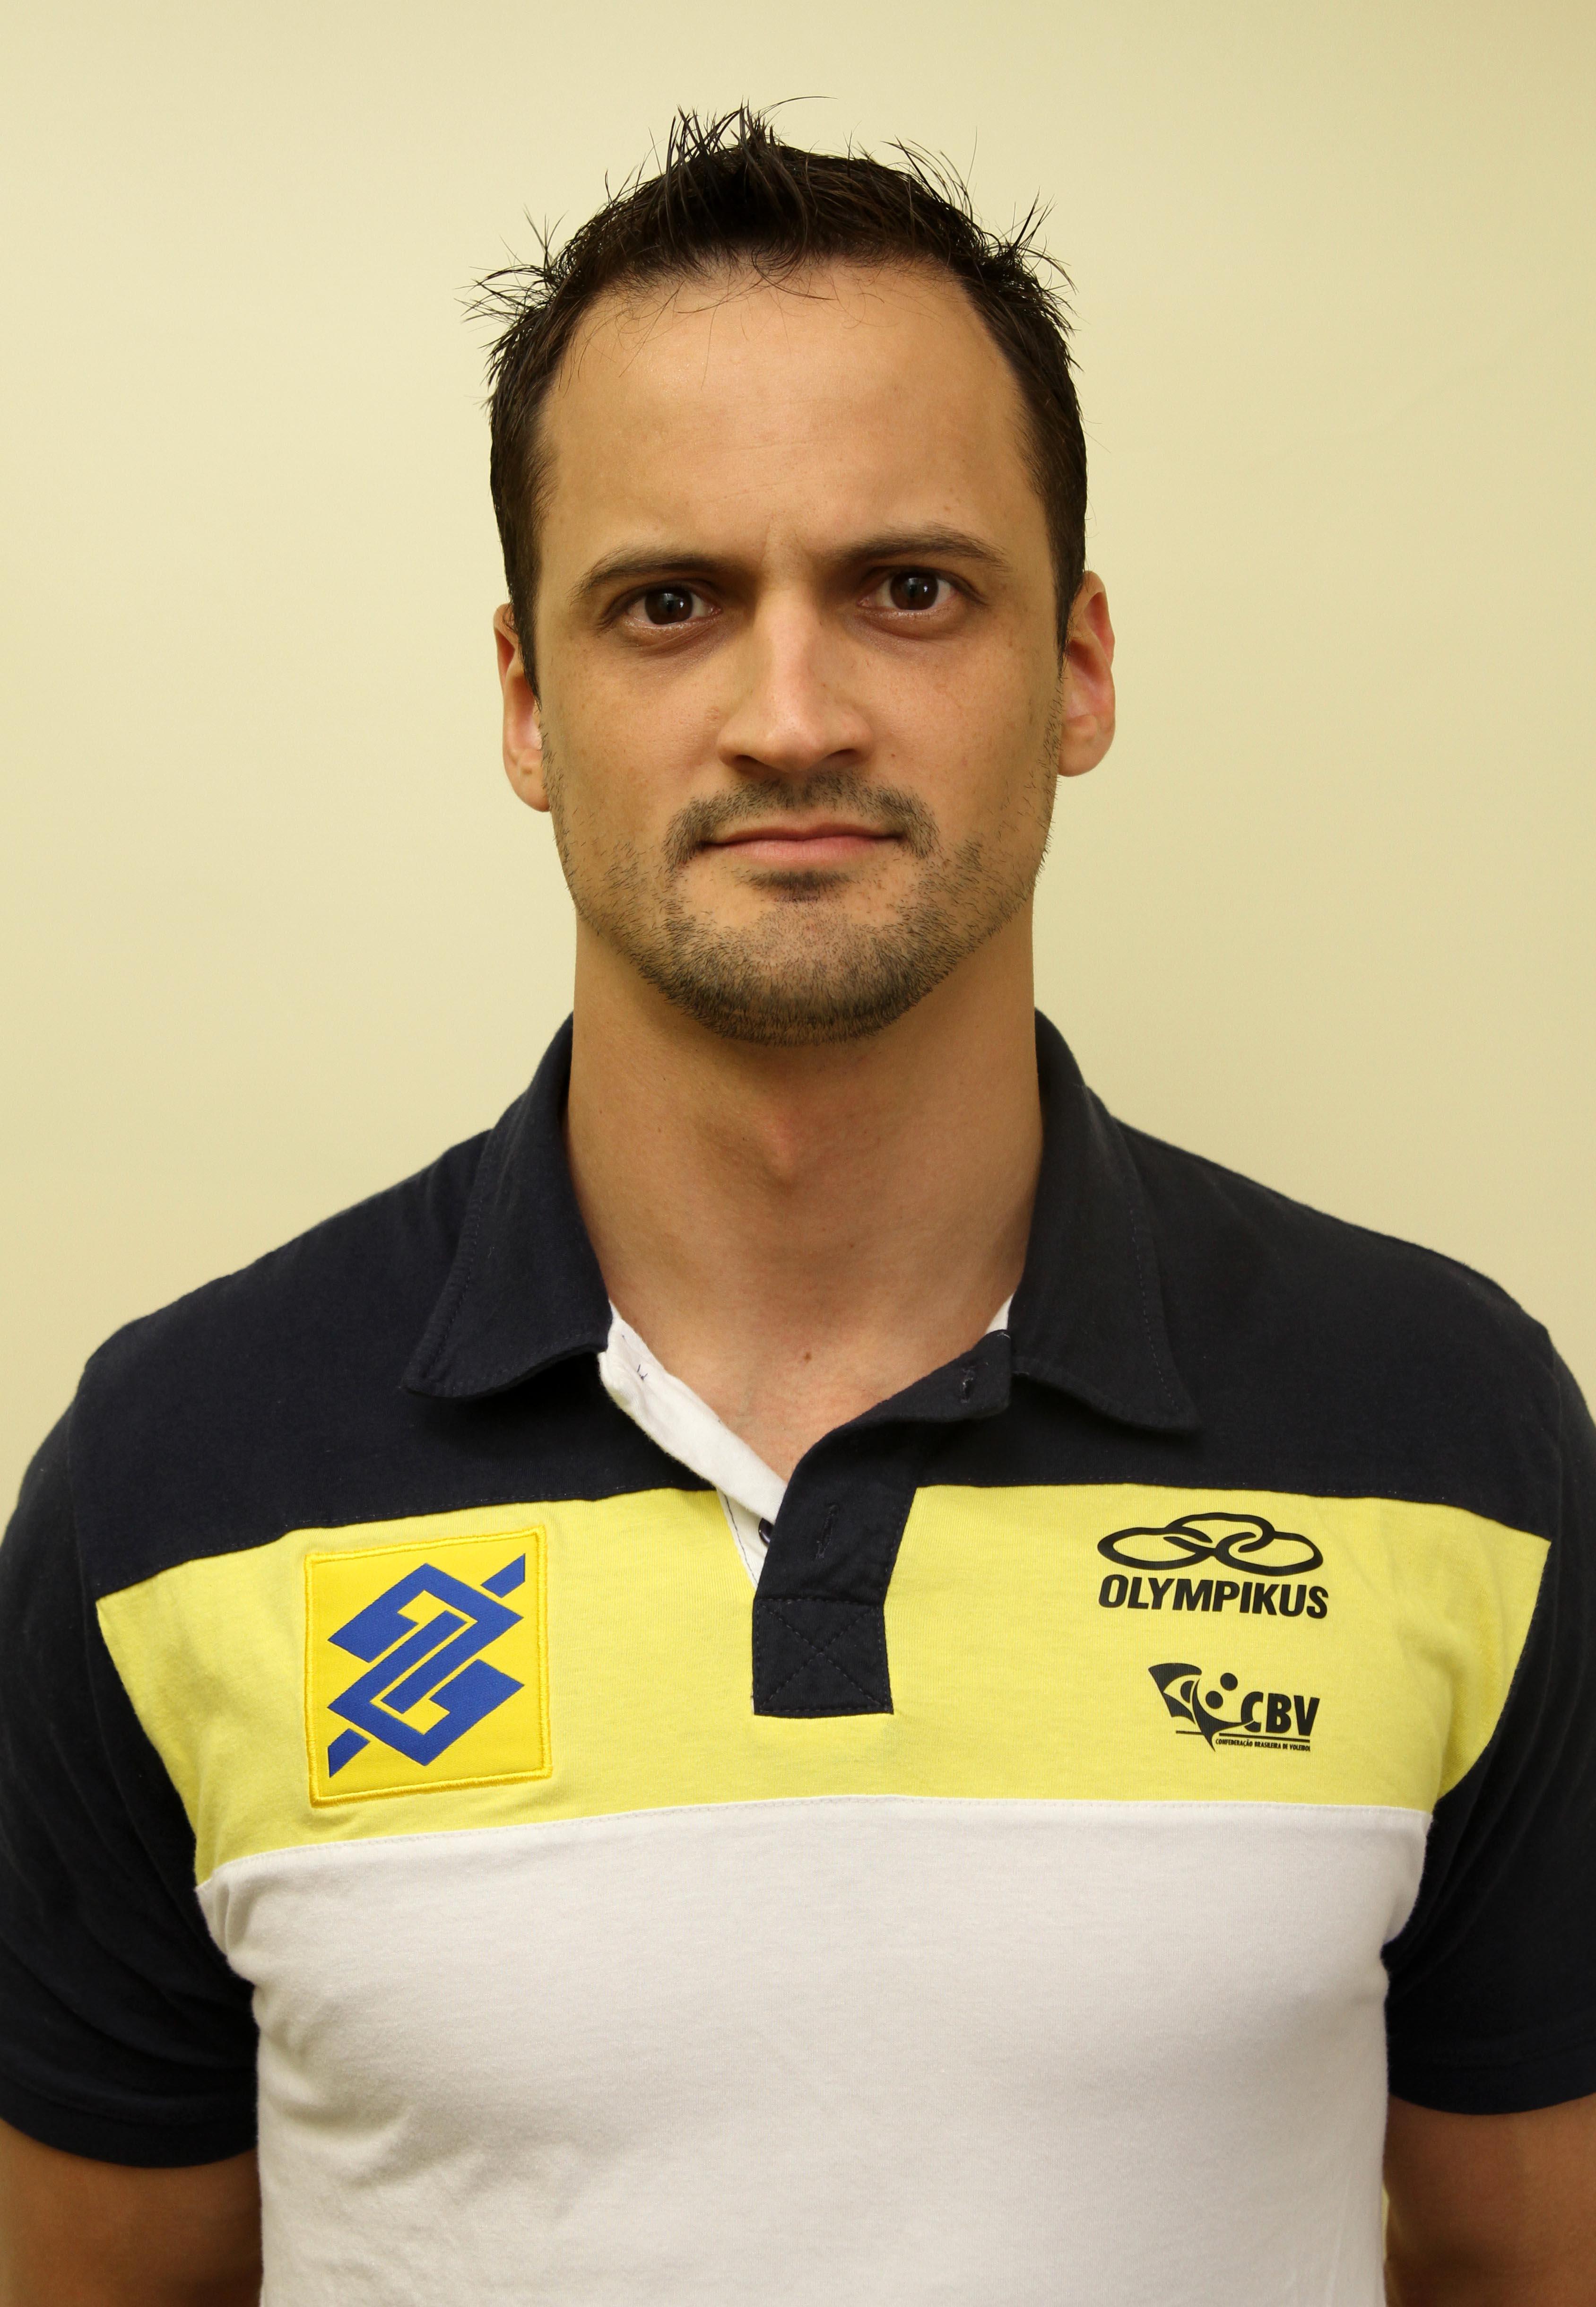 Luiz Felipe Marques Fonteles